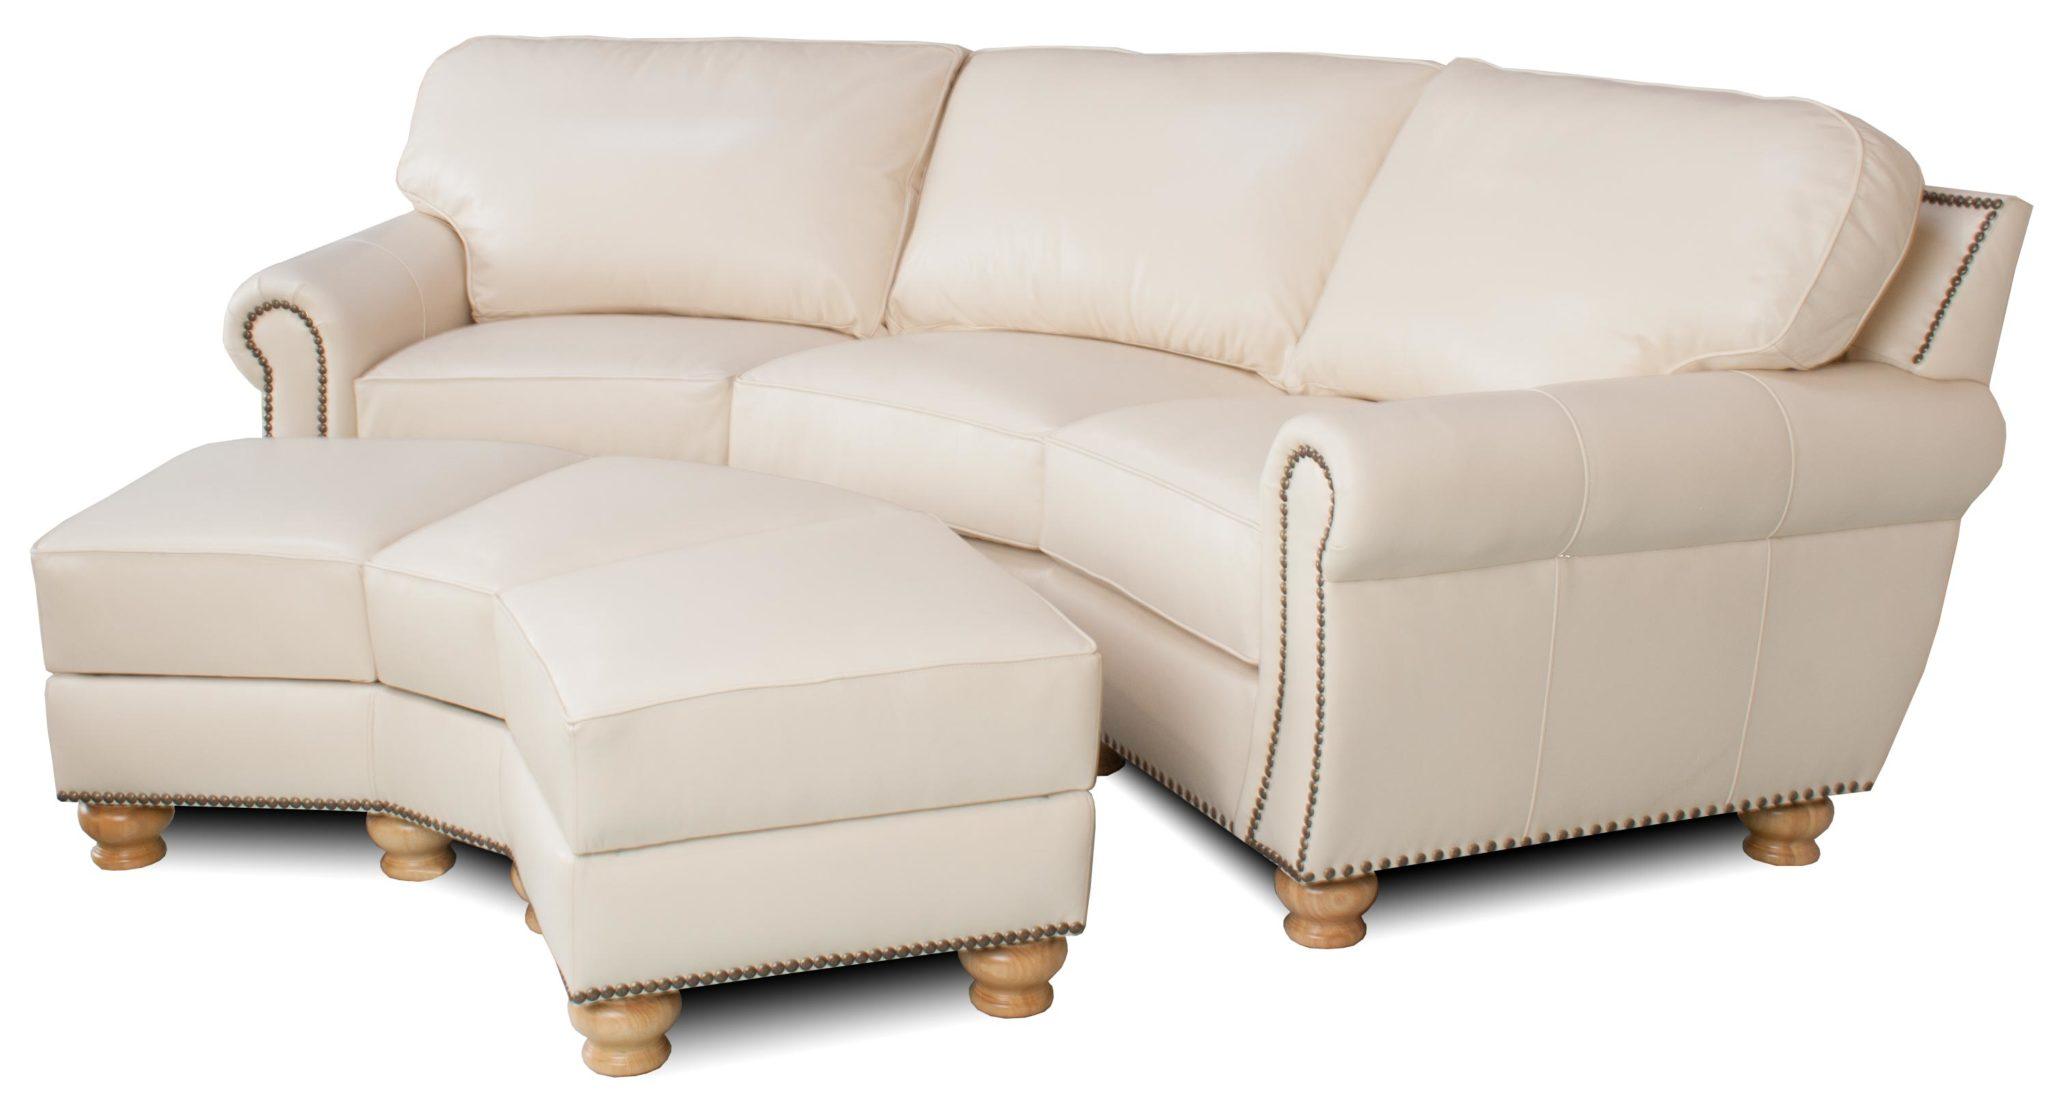 custom sectional sofa chicago santa monica rooms to go berkshire – leather